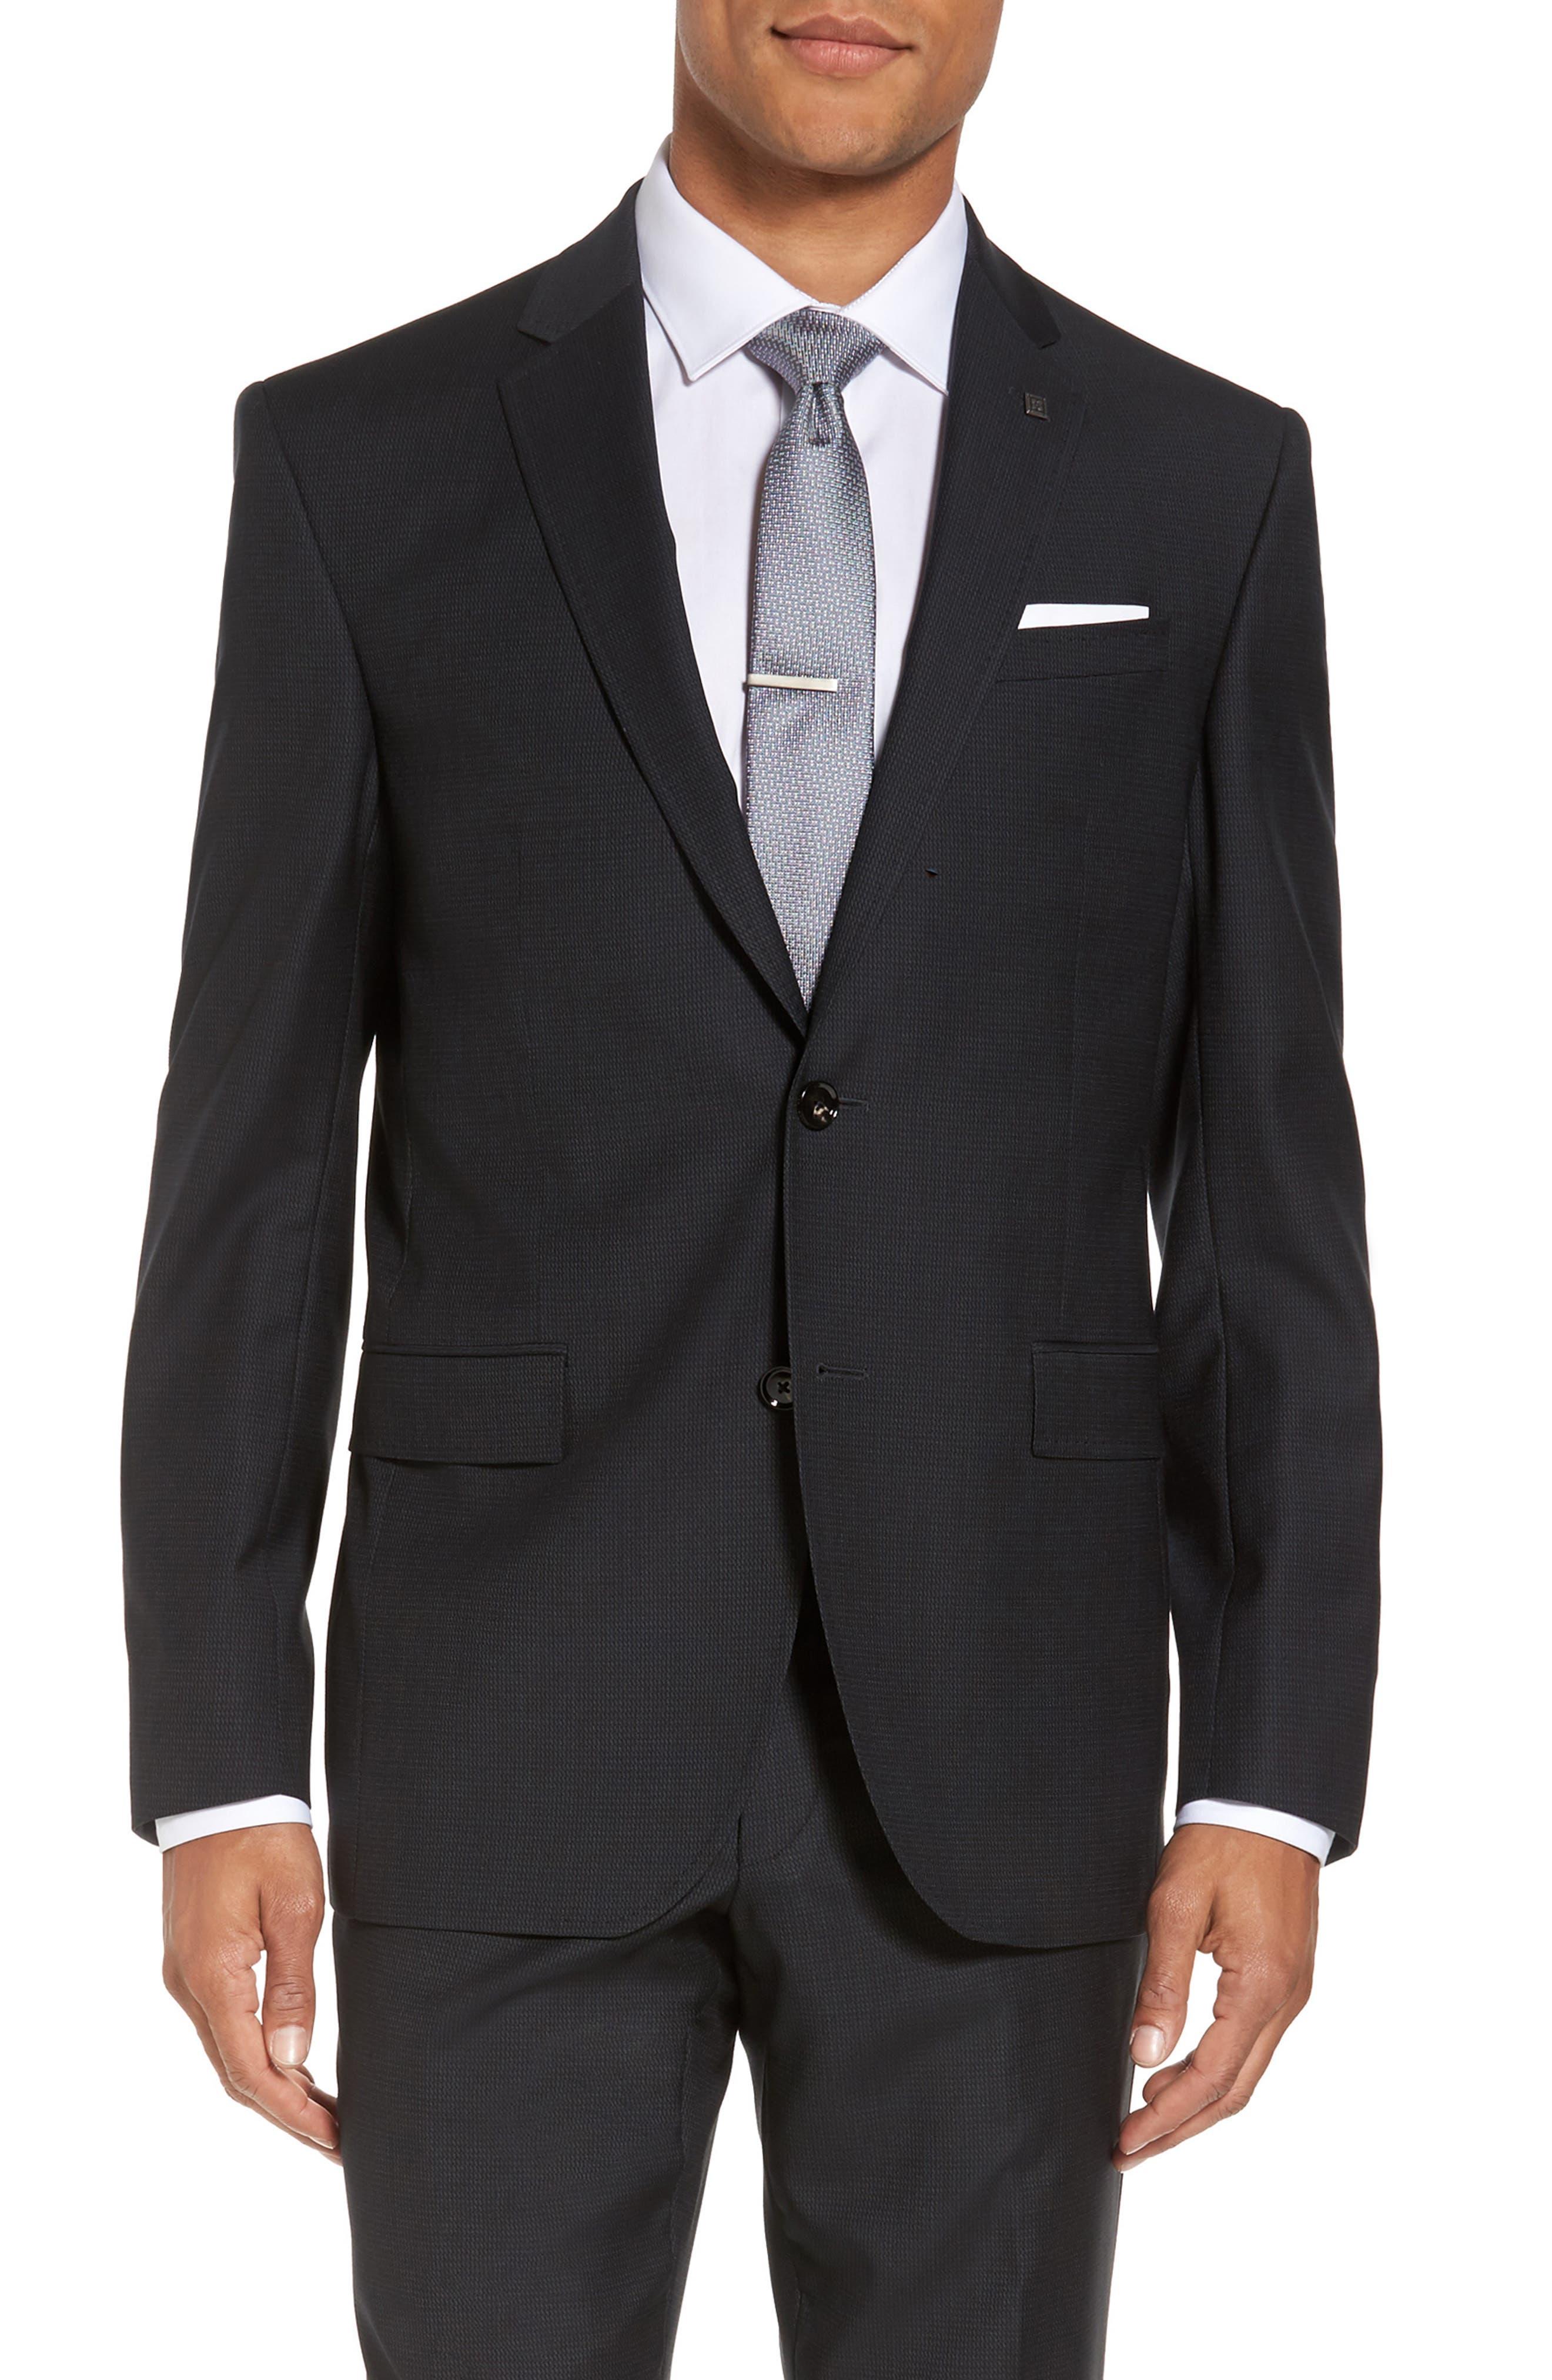 Jay Trim Fit Solid Wool Suit,                             Alternate thumbnail 6, color,                             001